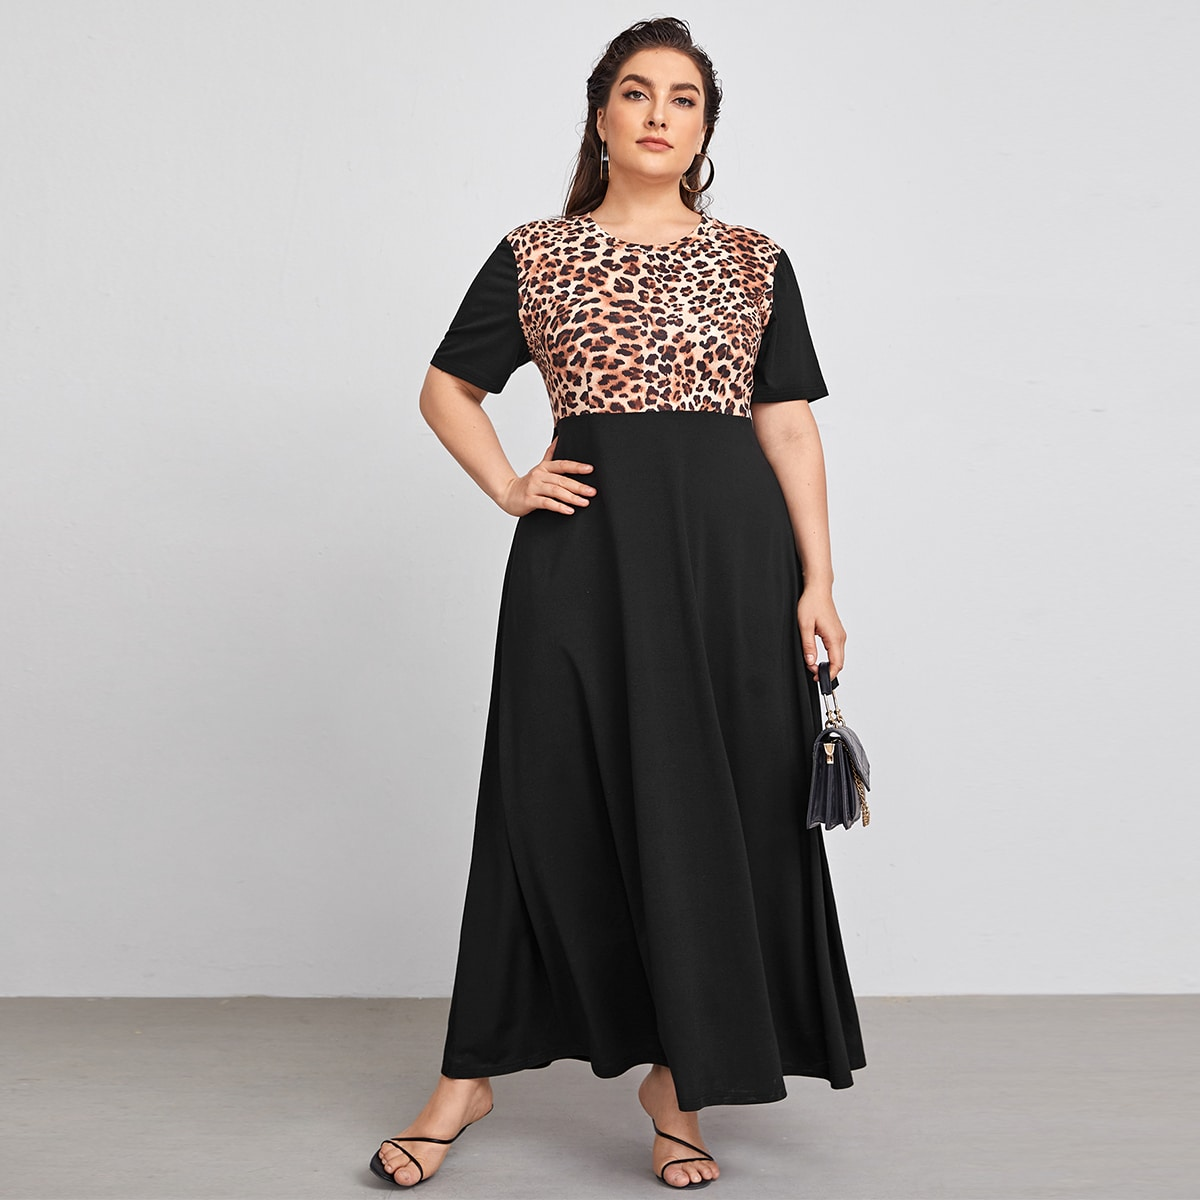 Plus Leopard Print Short Sleeve A-line Dress